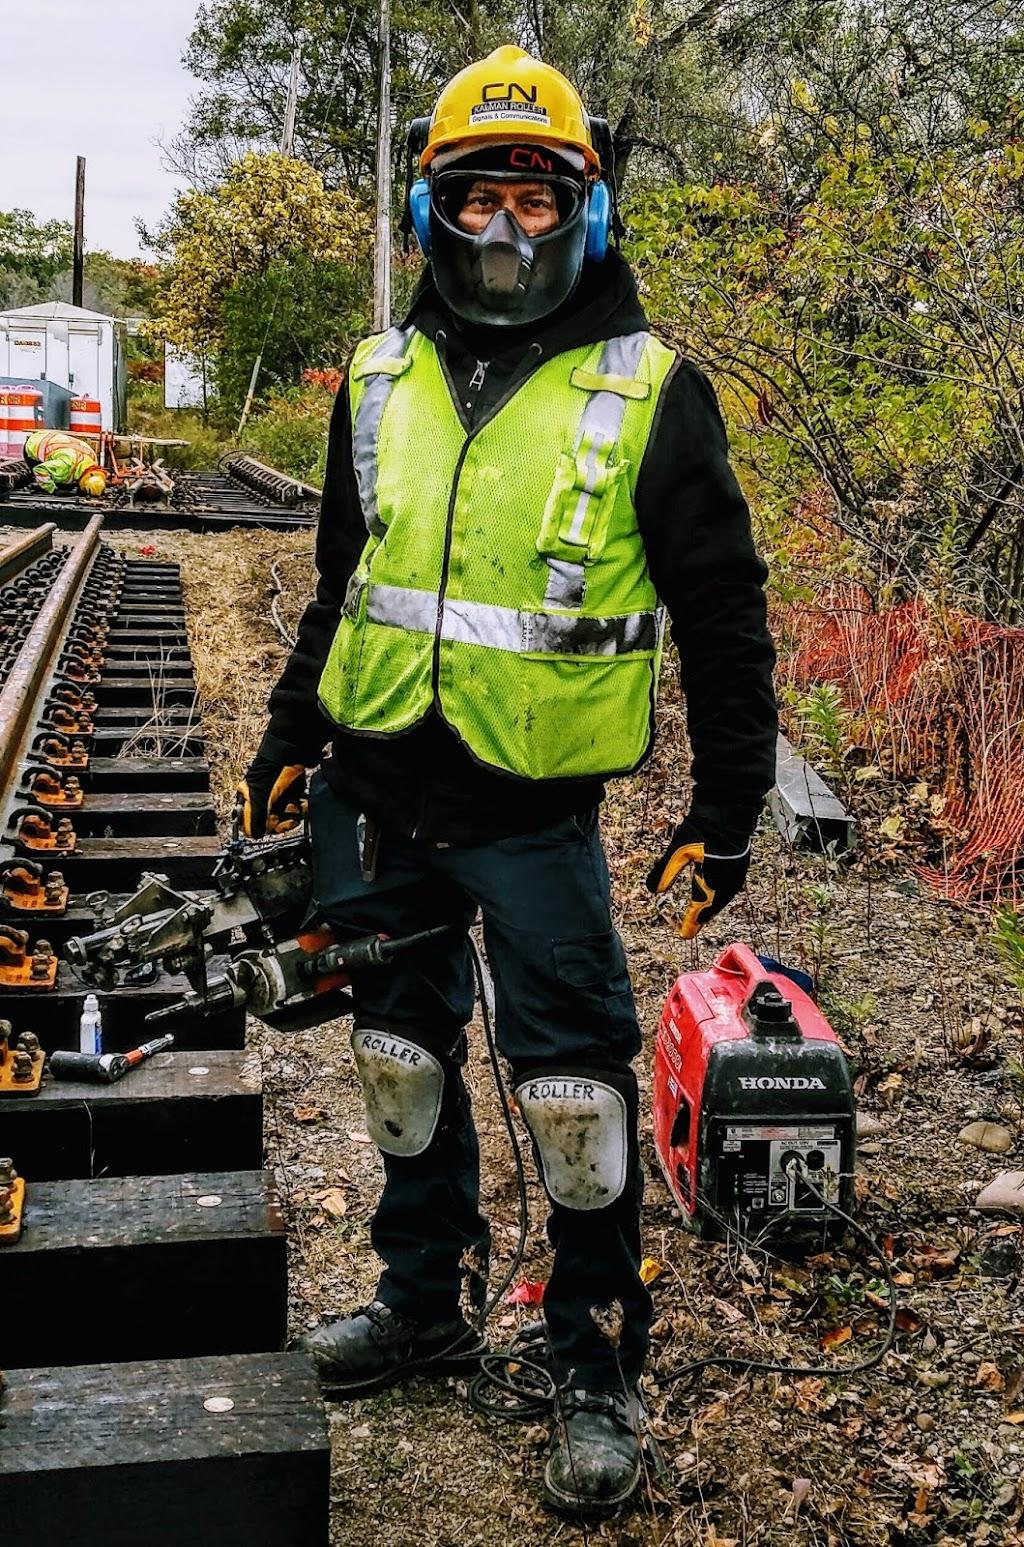 CN Rail Freight Depot | point of interest | 252 Stuart St, Hamilton, ON L8R 2W6, Canada | 9282280761 OR +1 928-228-0761